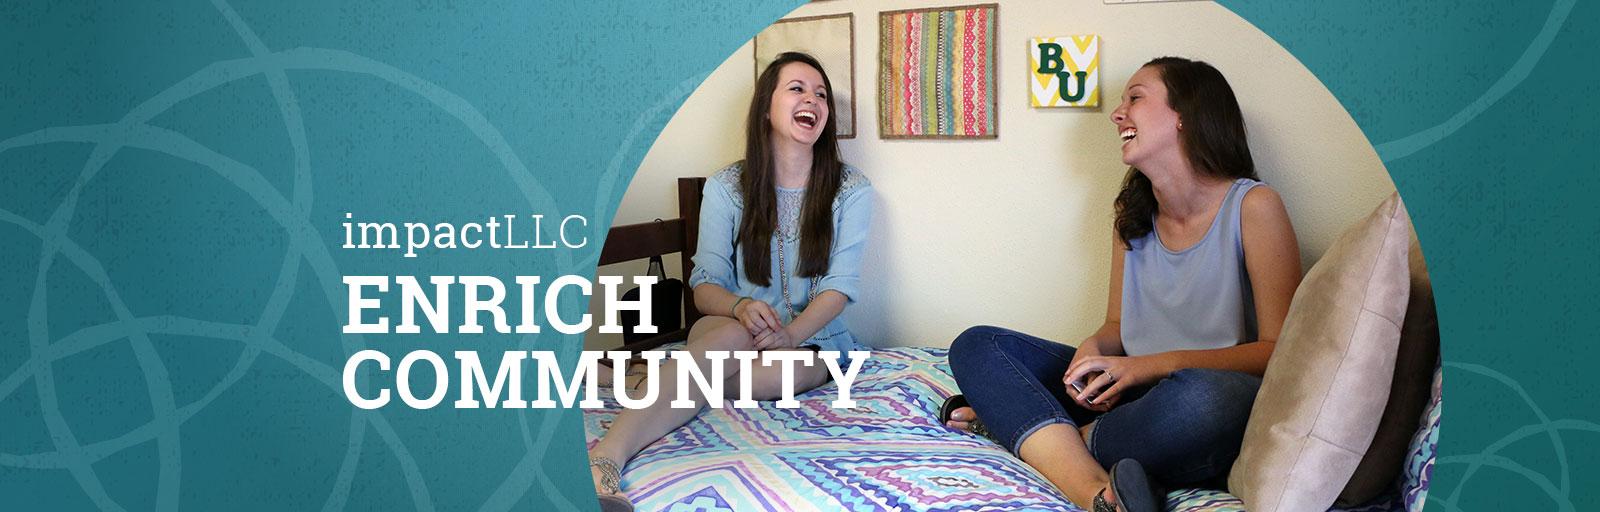 mc_llc-impact-enrich-community